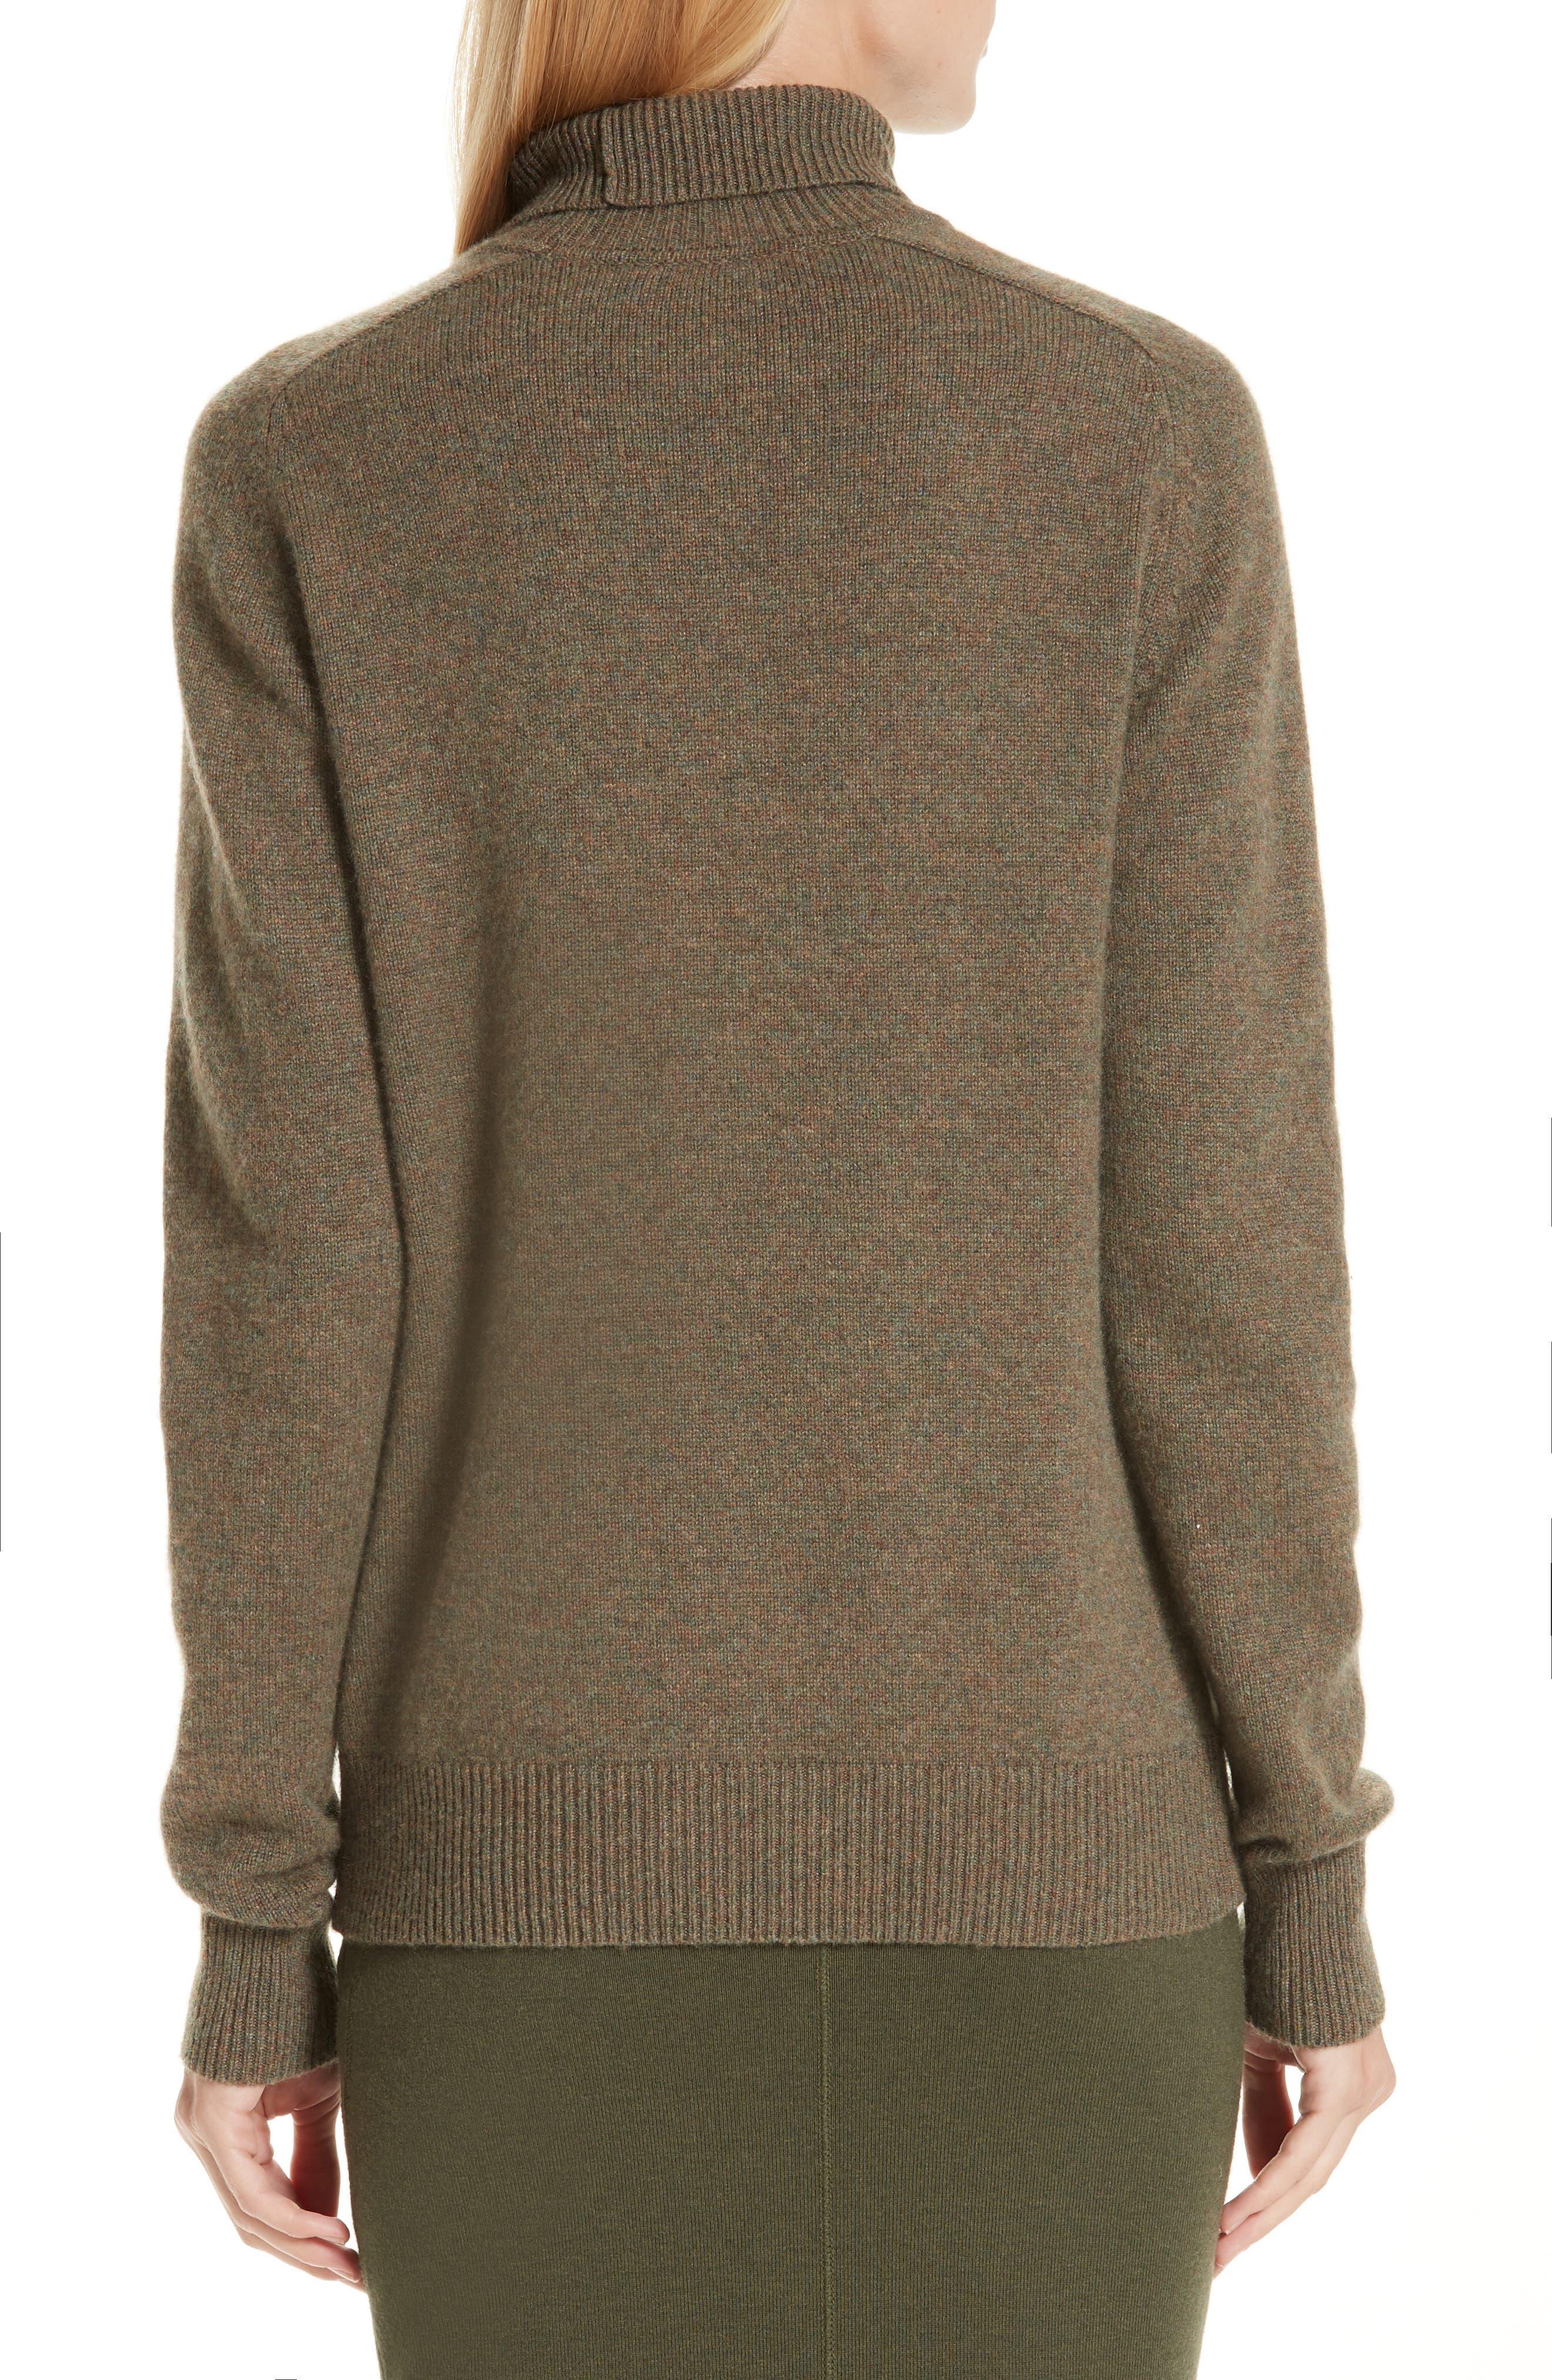 VICTORIA BECKHAM, Stretch Cashmere Turtleneck Sweater, Alternate thumbnail 2, color, OLIVE